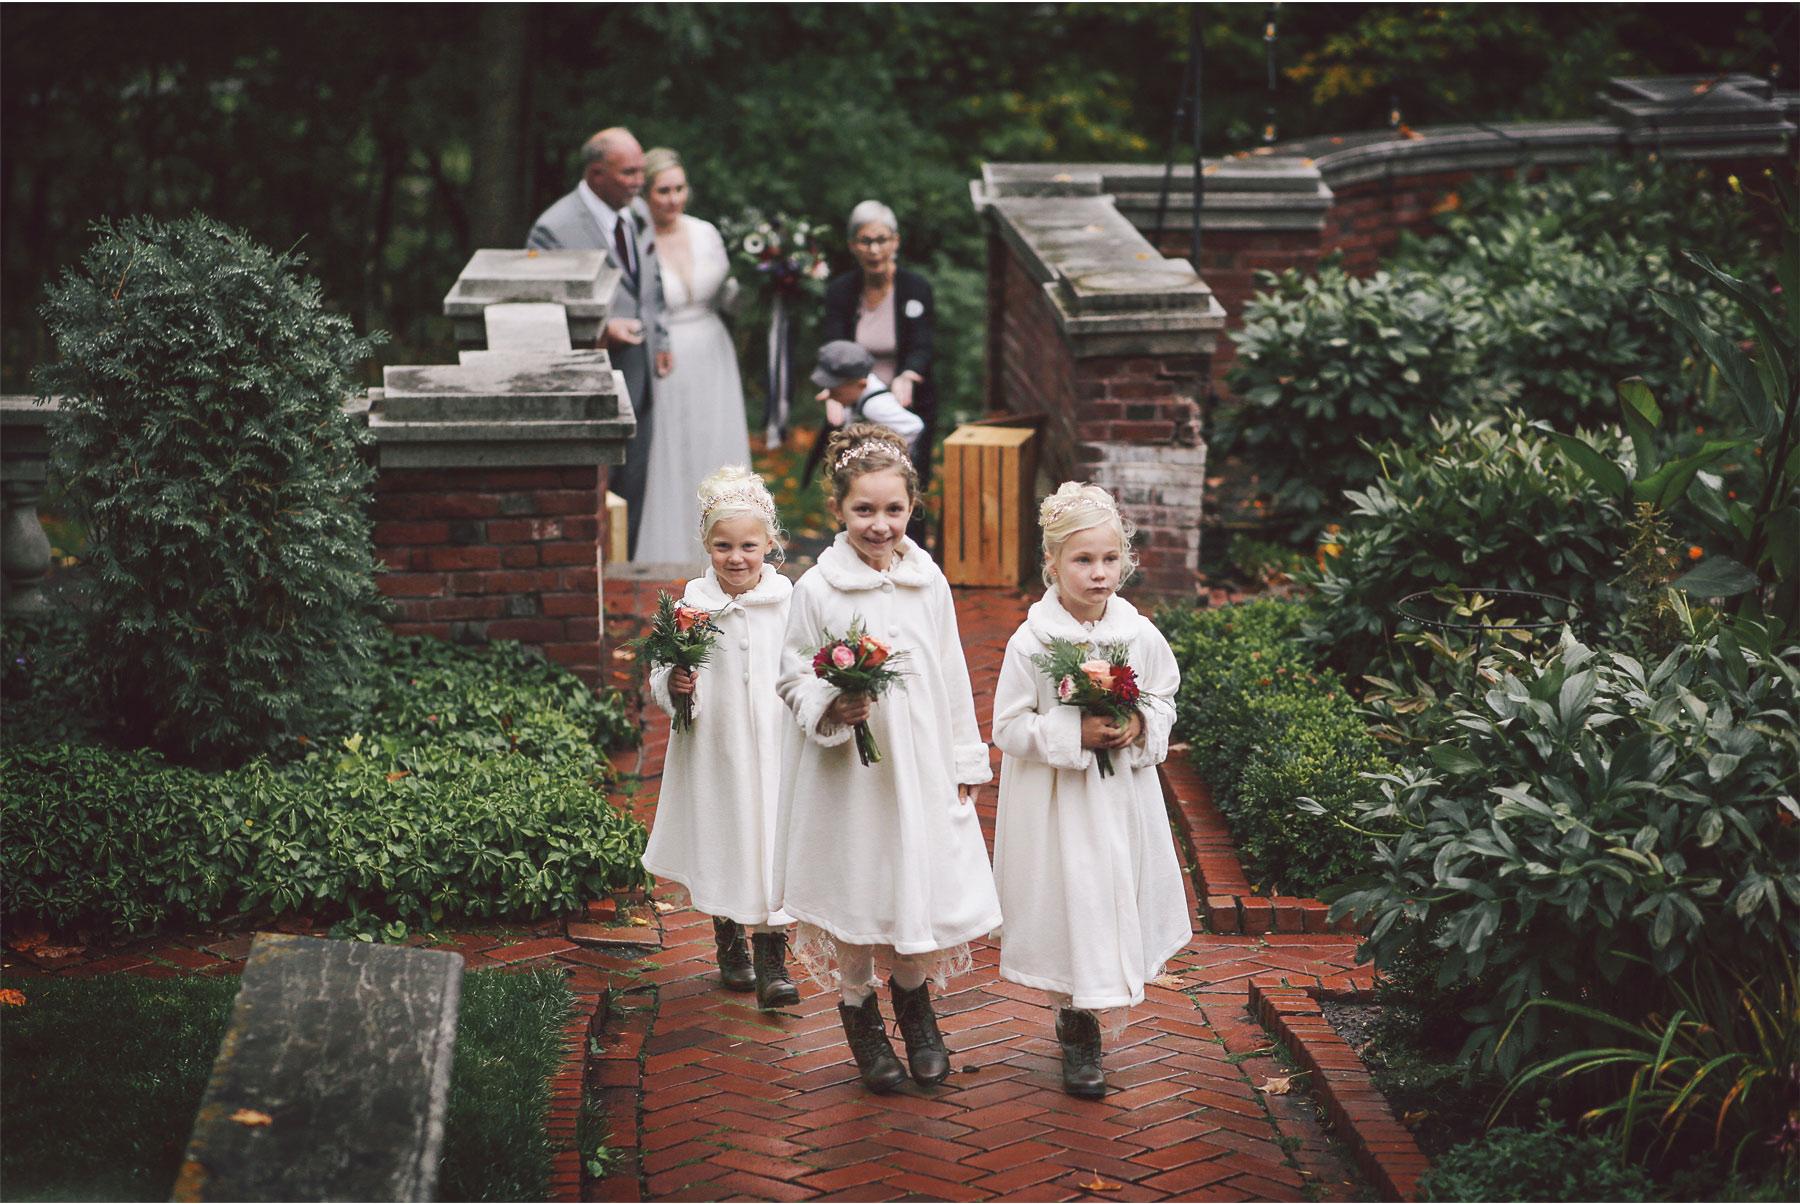 11-Duluth-Minnesota-Wedding-Photography-by-Vick-Photography-Glensheen-Mansion-Flower-Girls-Outdoor-Ceremony-Rain-Fall-Autumn-Kelli-and-Marc.jpg